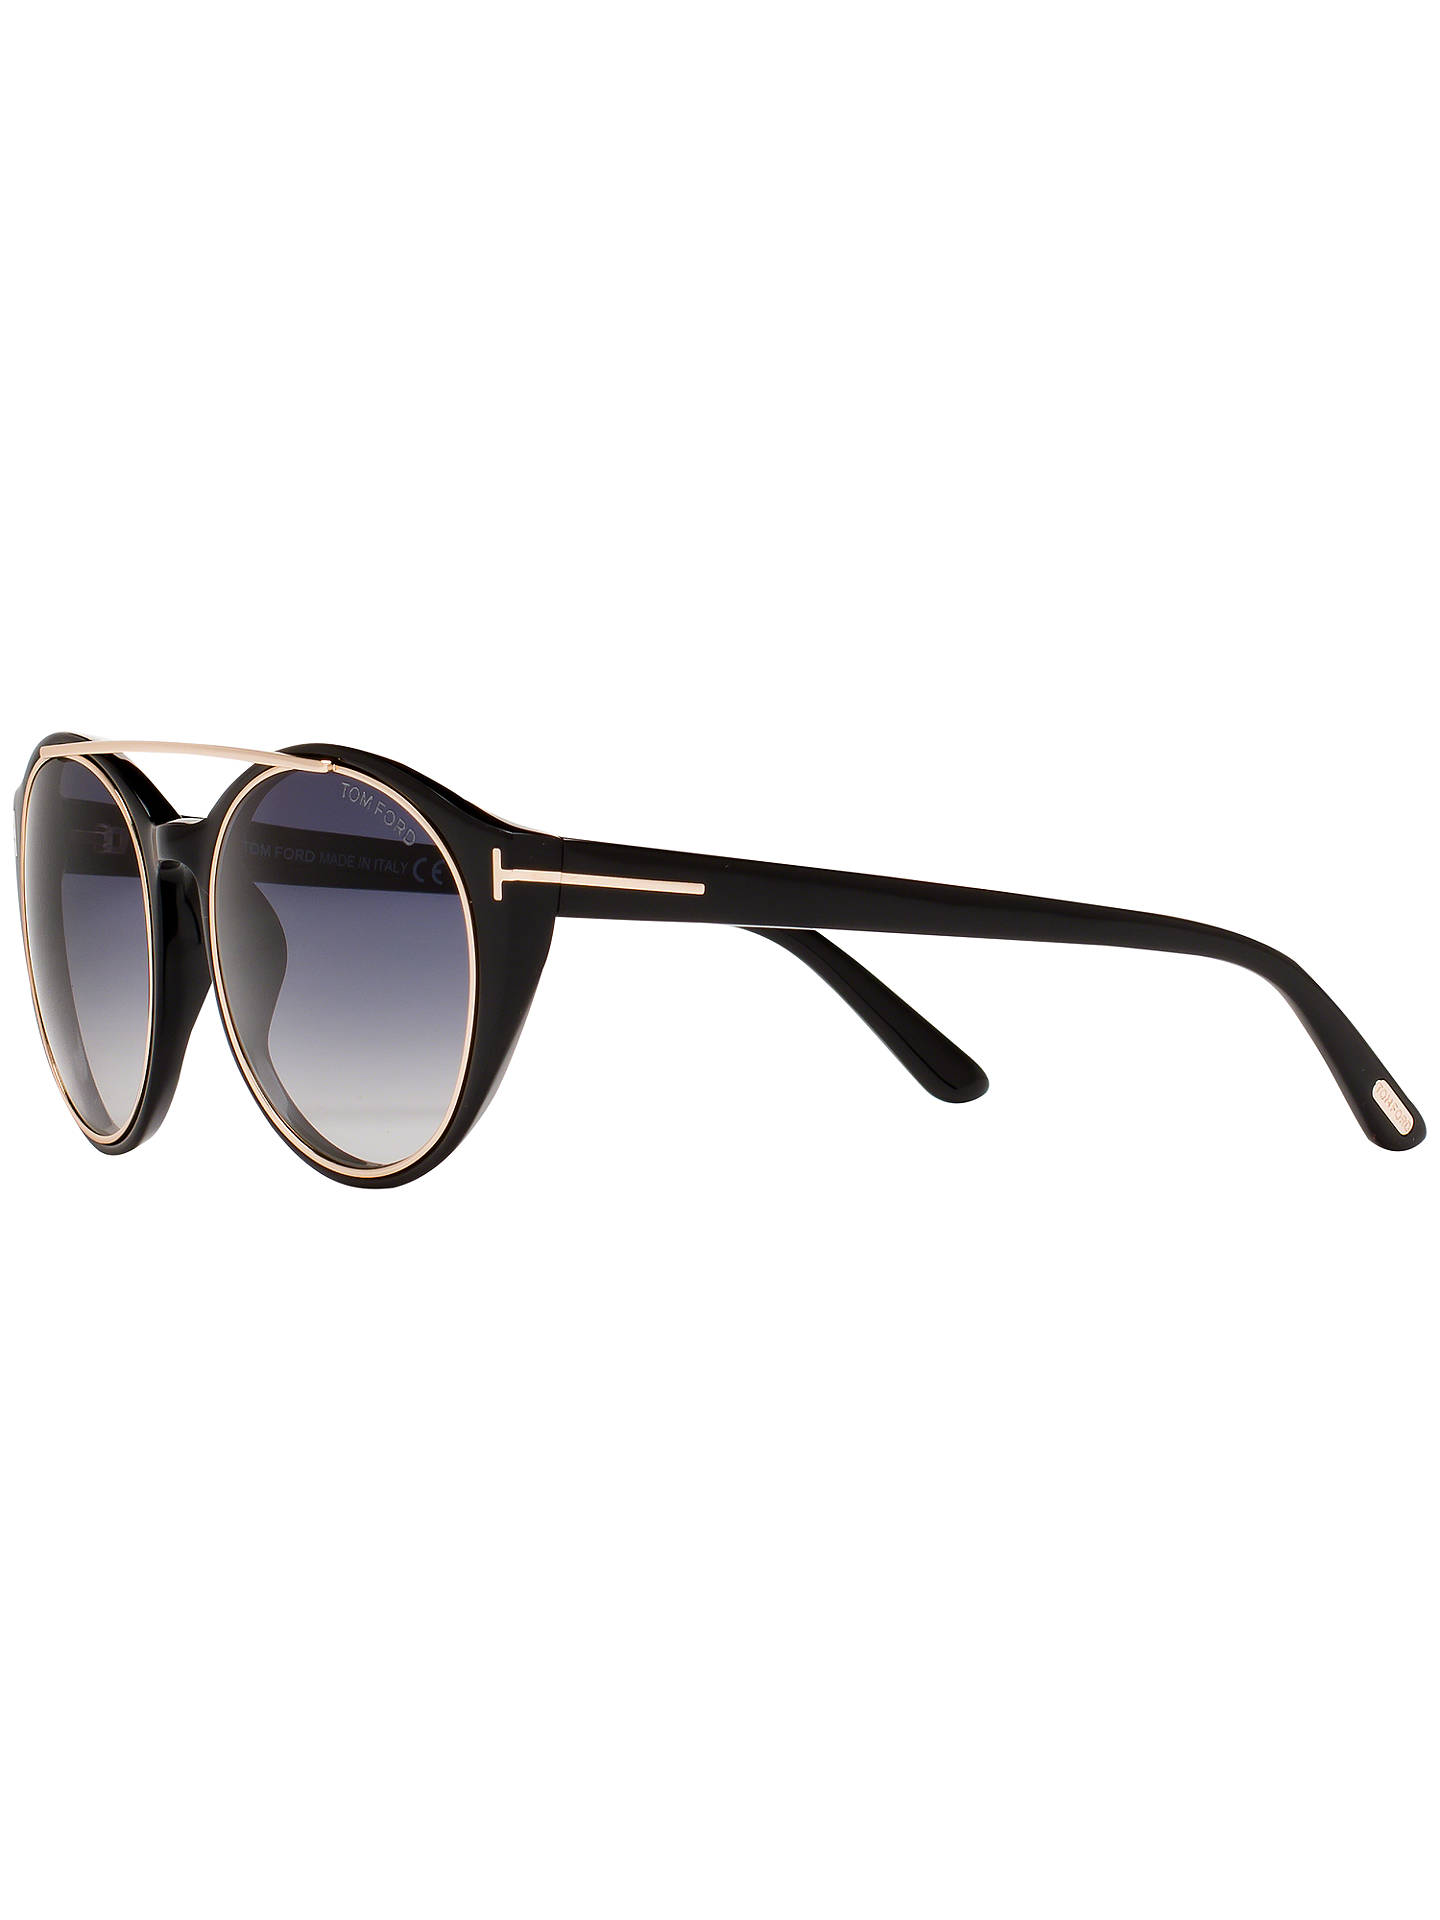 5fb3c394d1 ... Buy TOM FORD FT0383 Joan Sunglasses